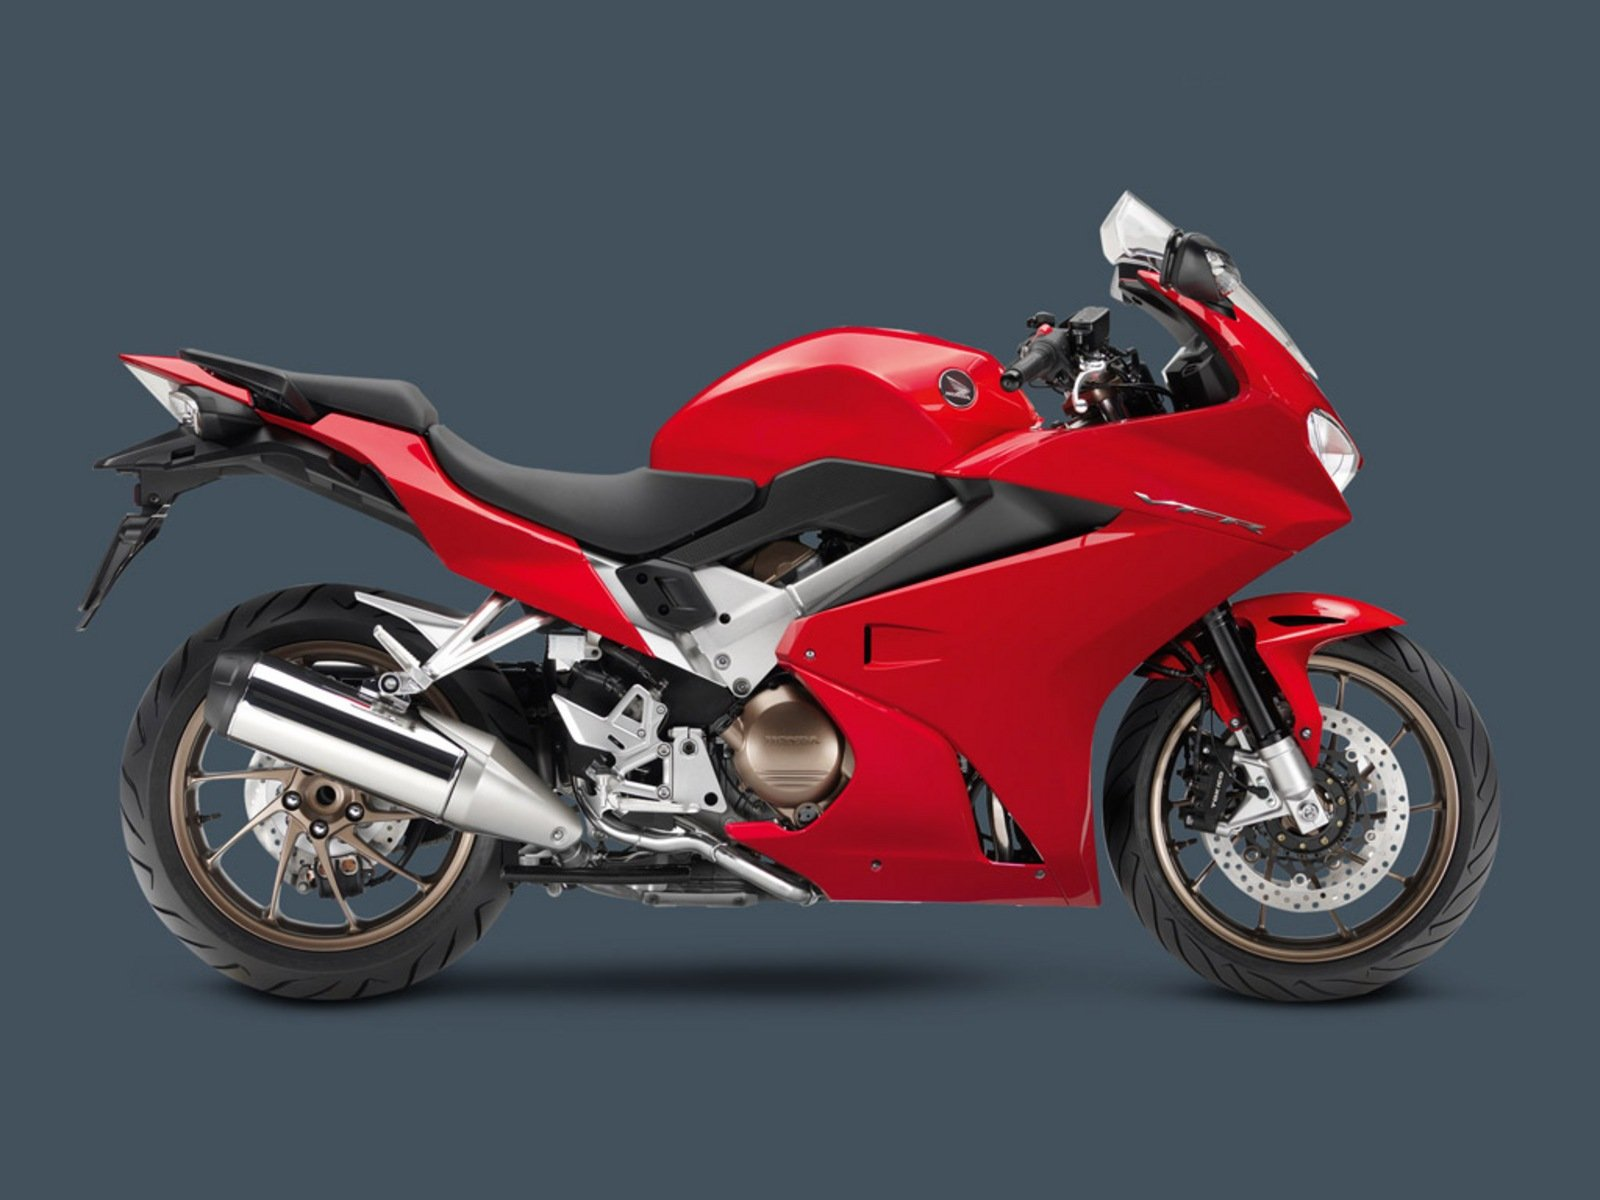 Interceptor 2014 Honda